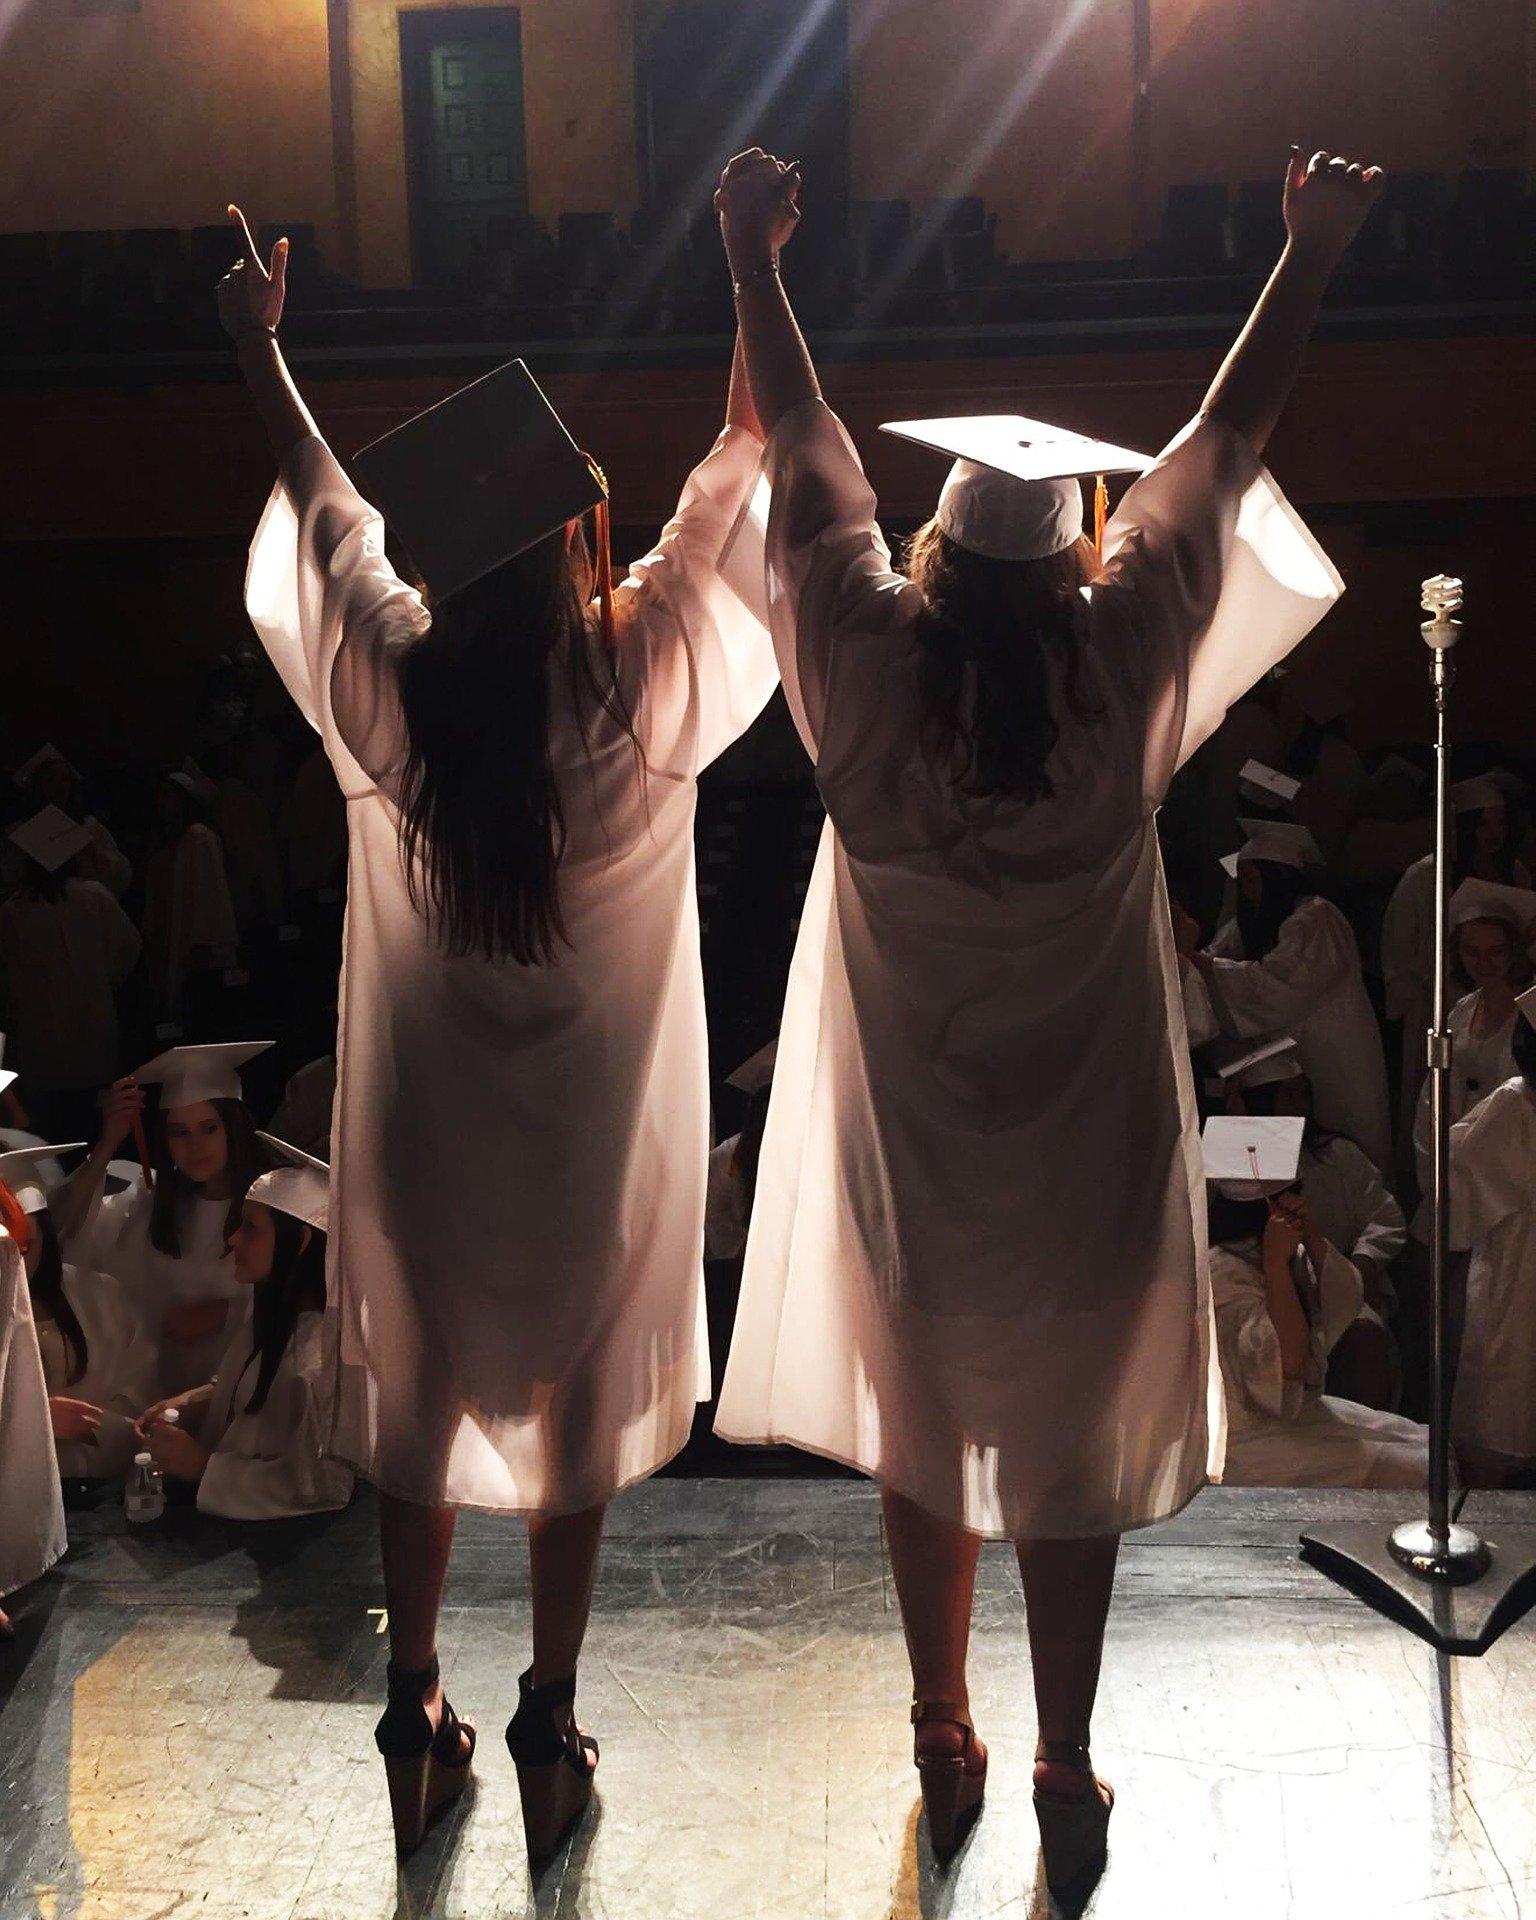 https://institutokailua.com/blog/wp-content/uploads/2019/11/graduation-2308406_1920-2.jpg